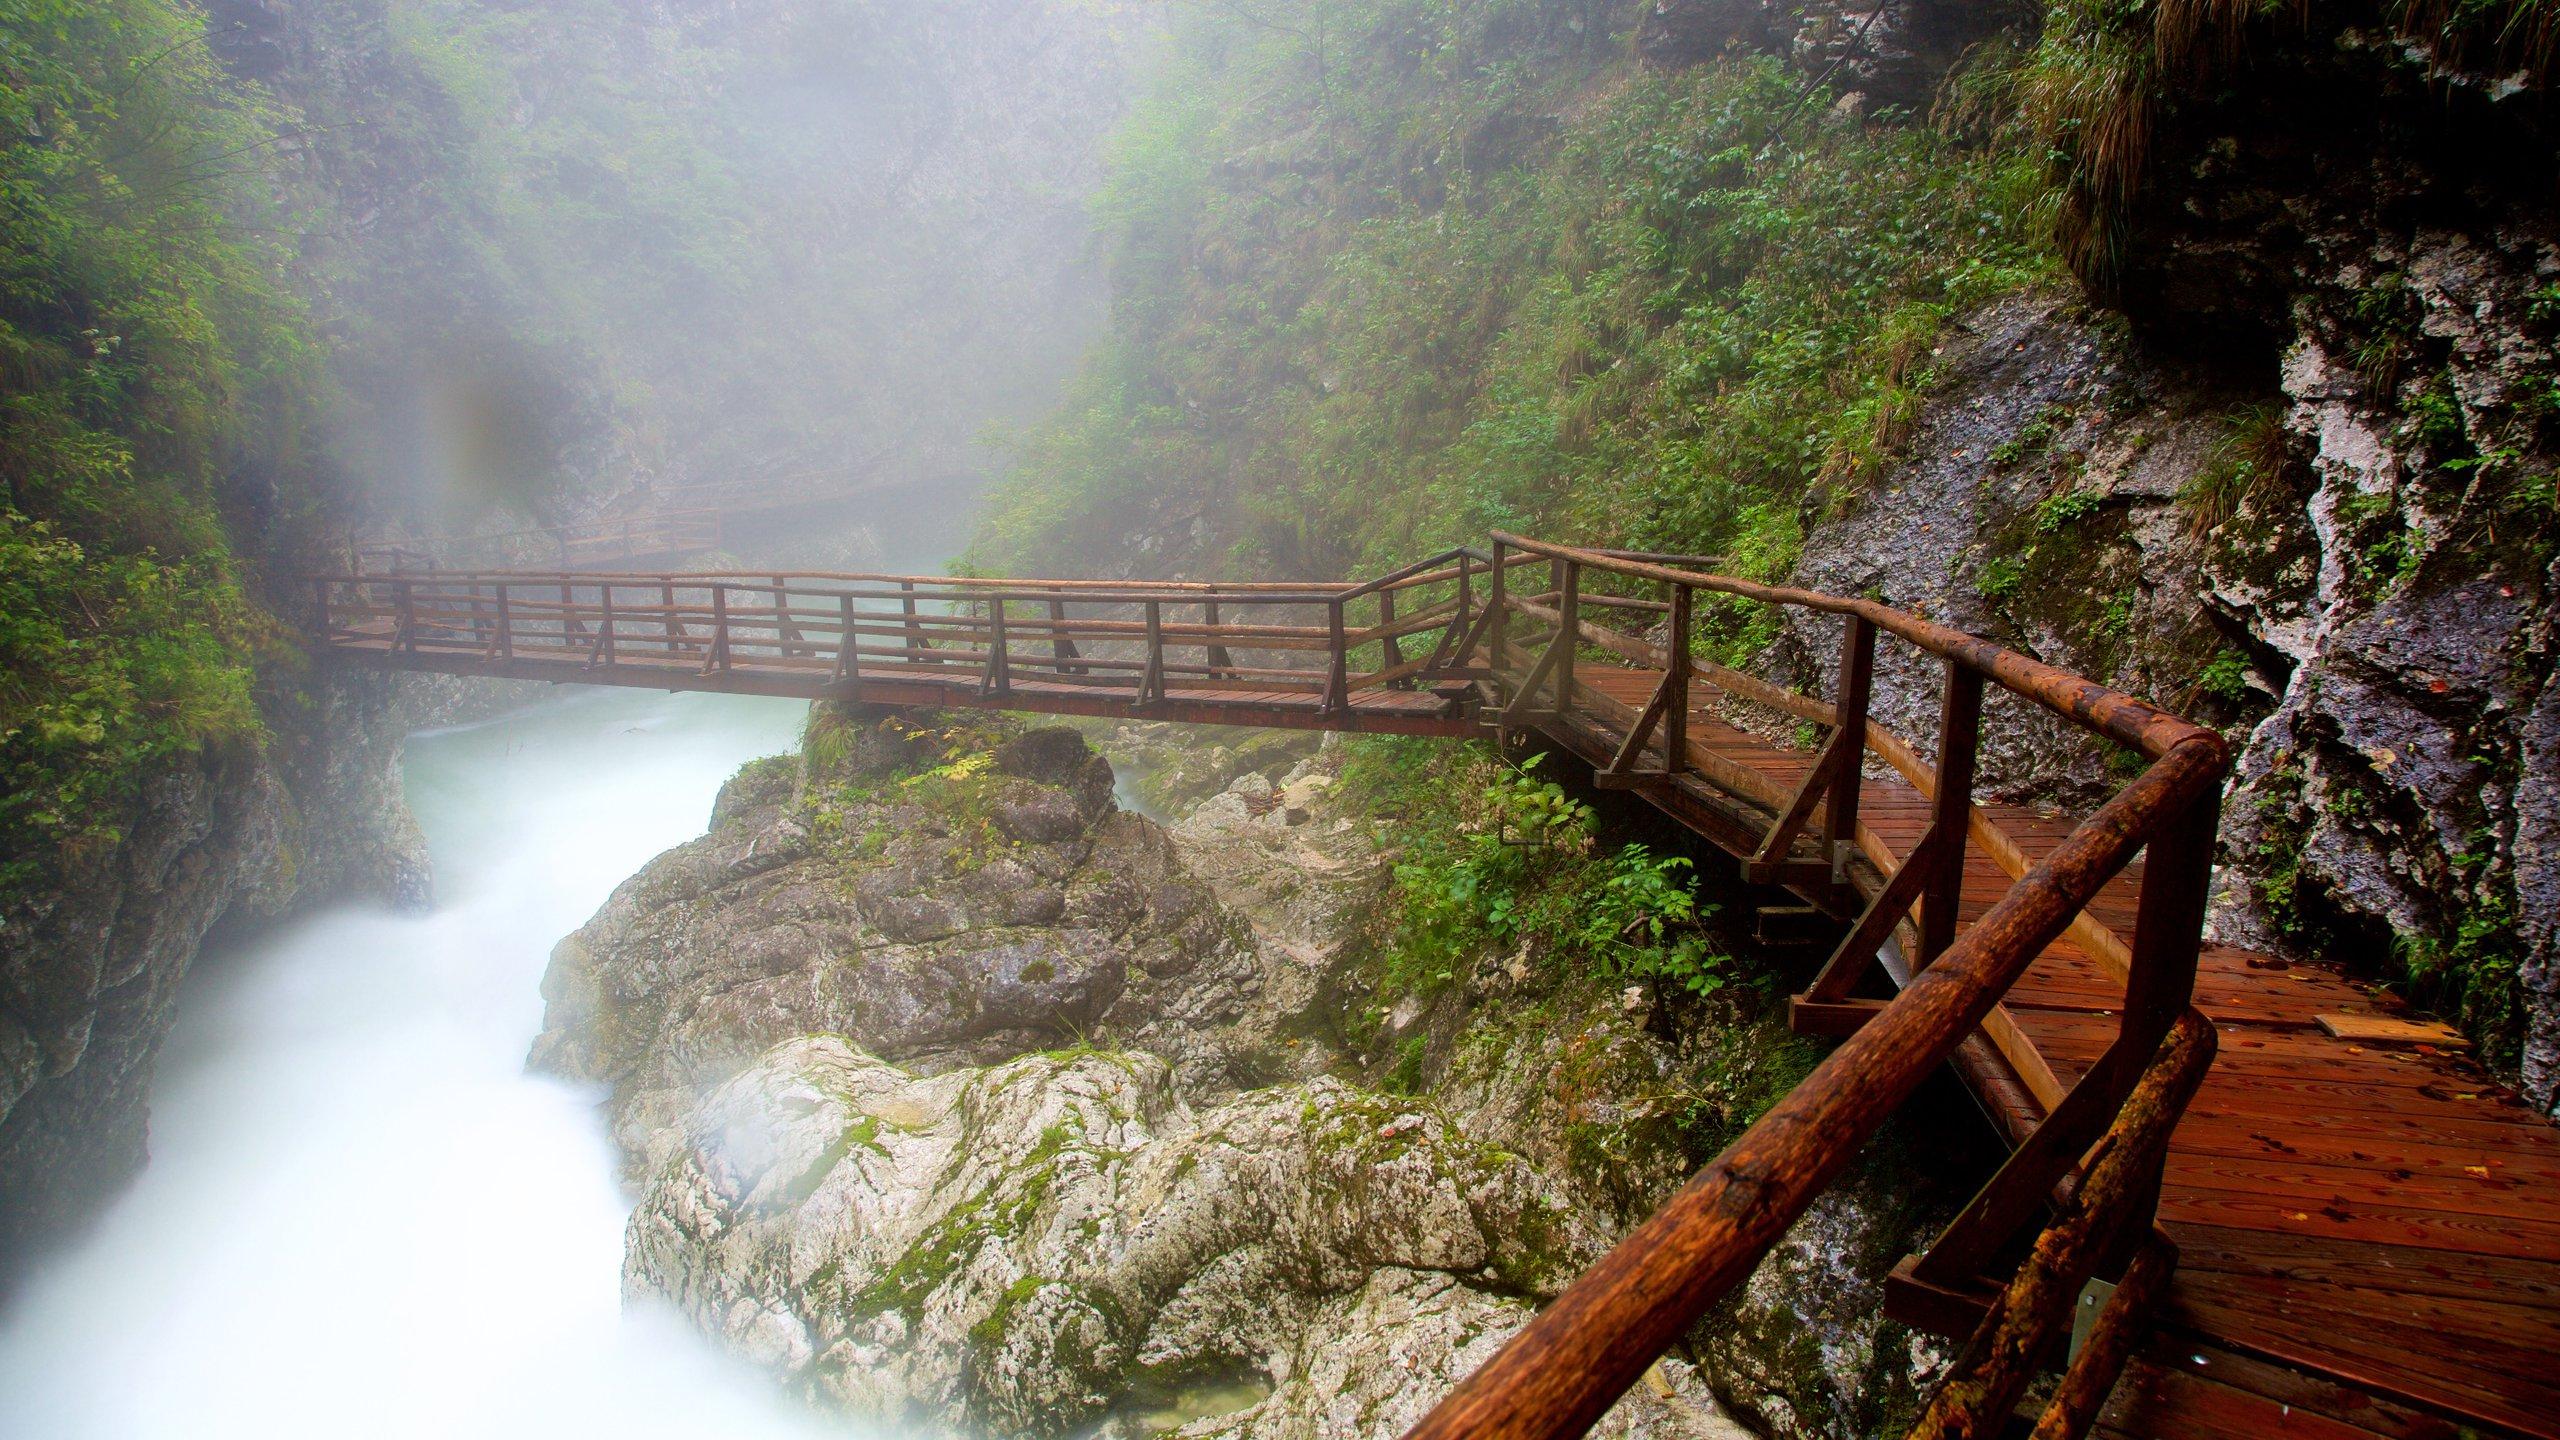 Vintgar Gorge, Gorje, Slovenia